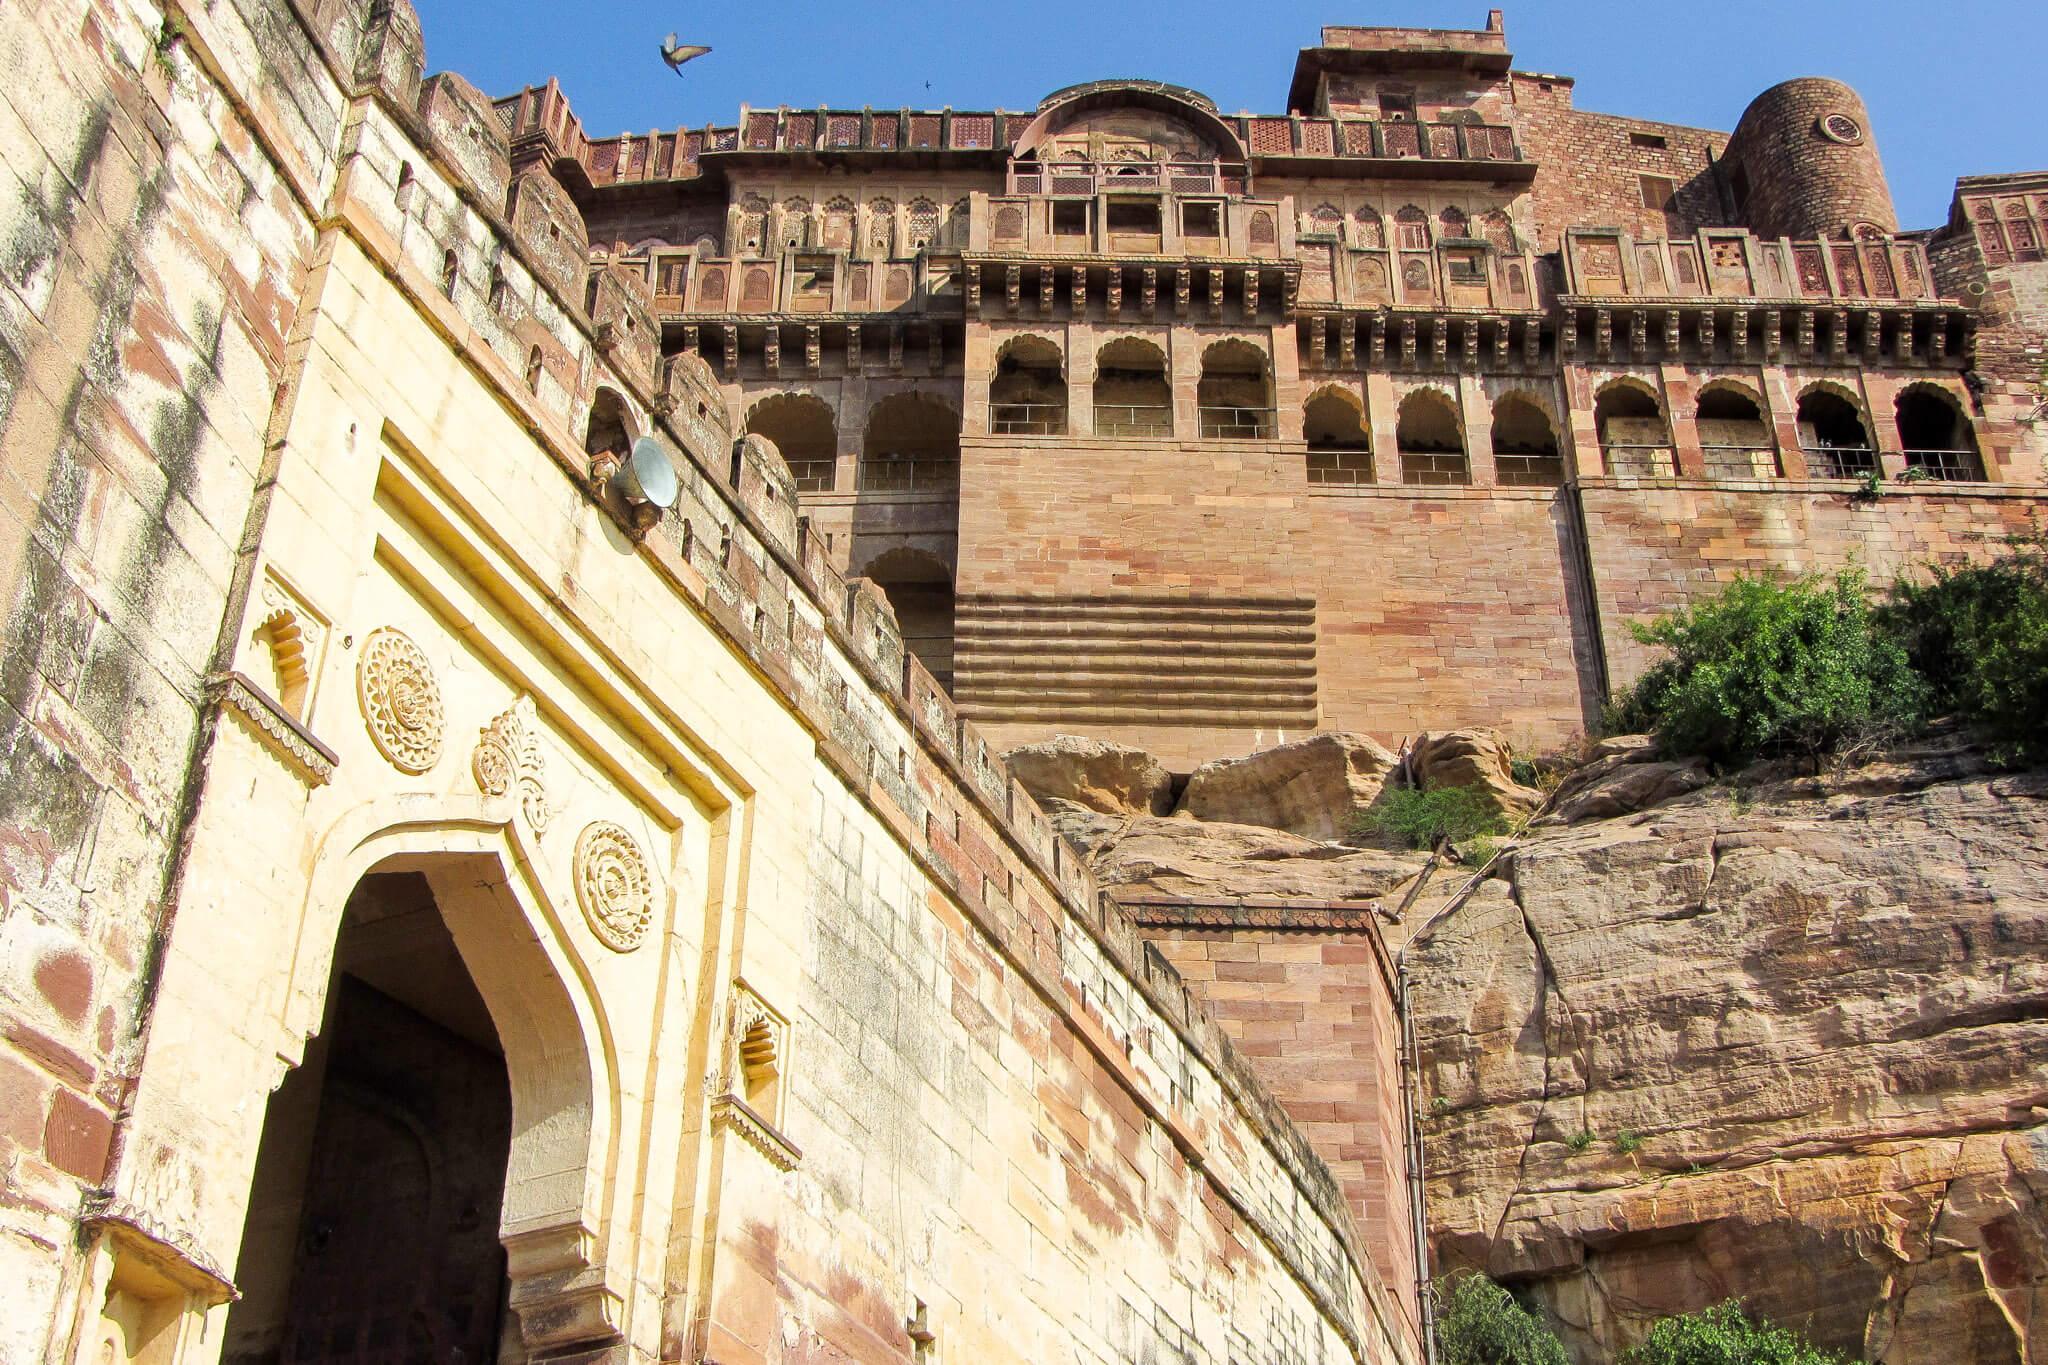 The big bad fortress of Jodphur